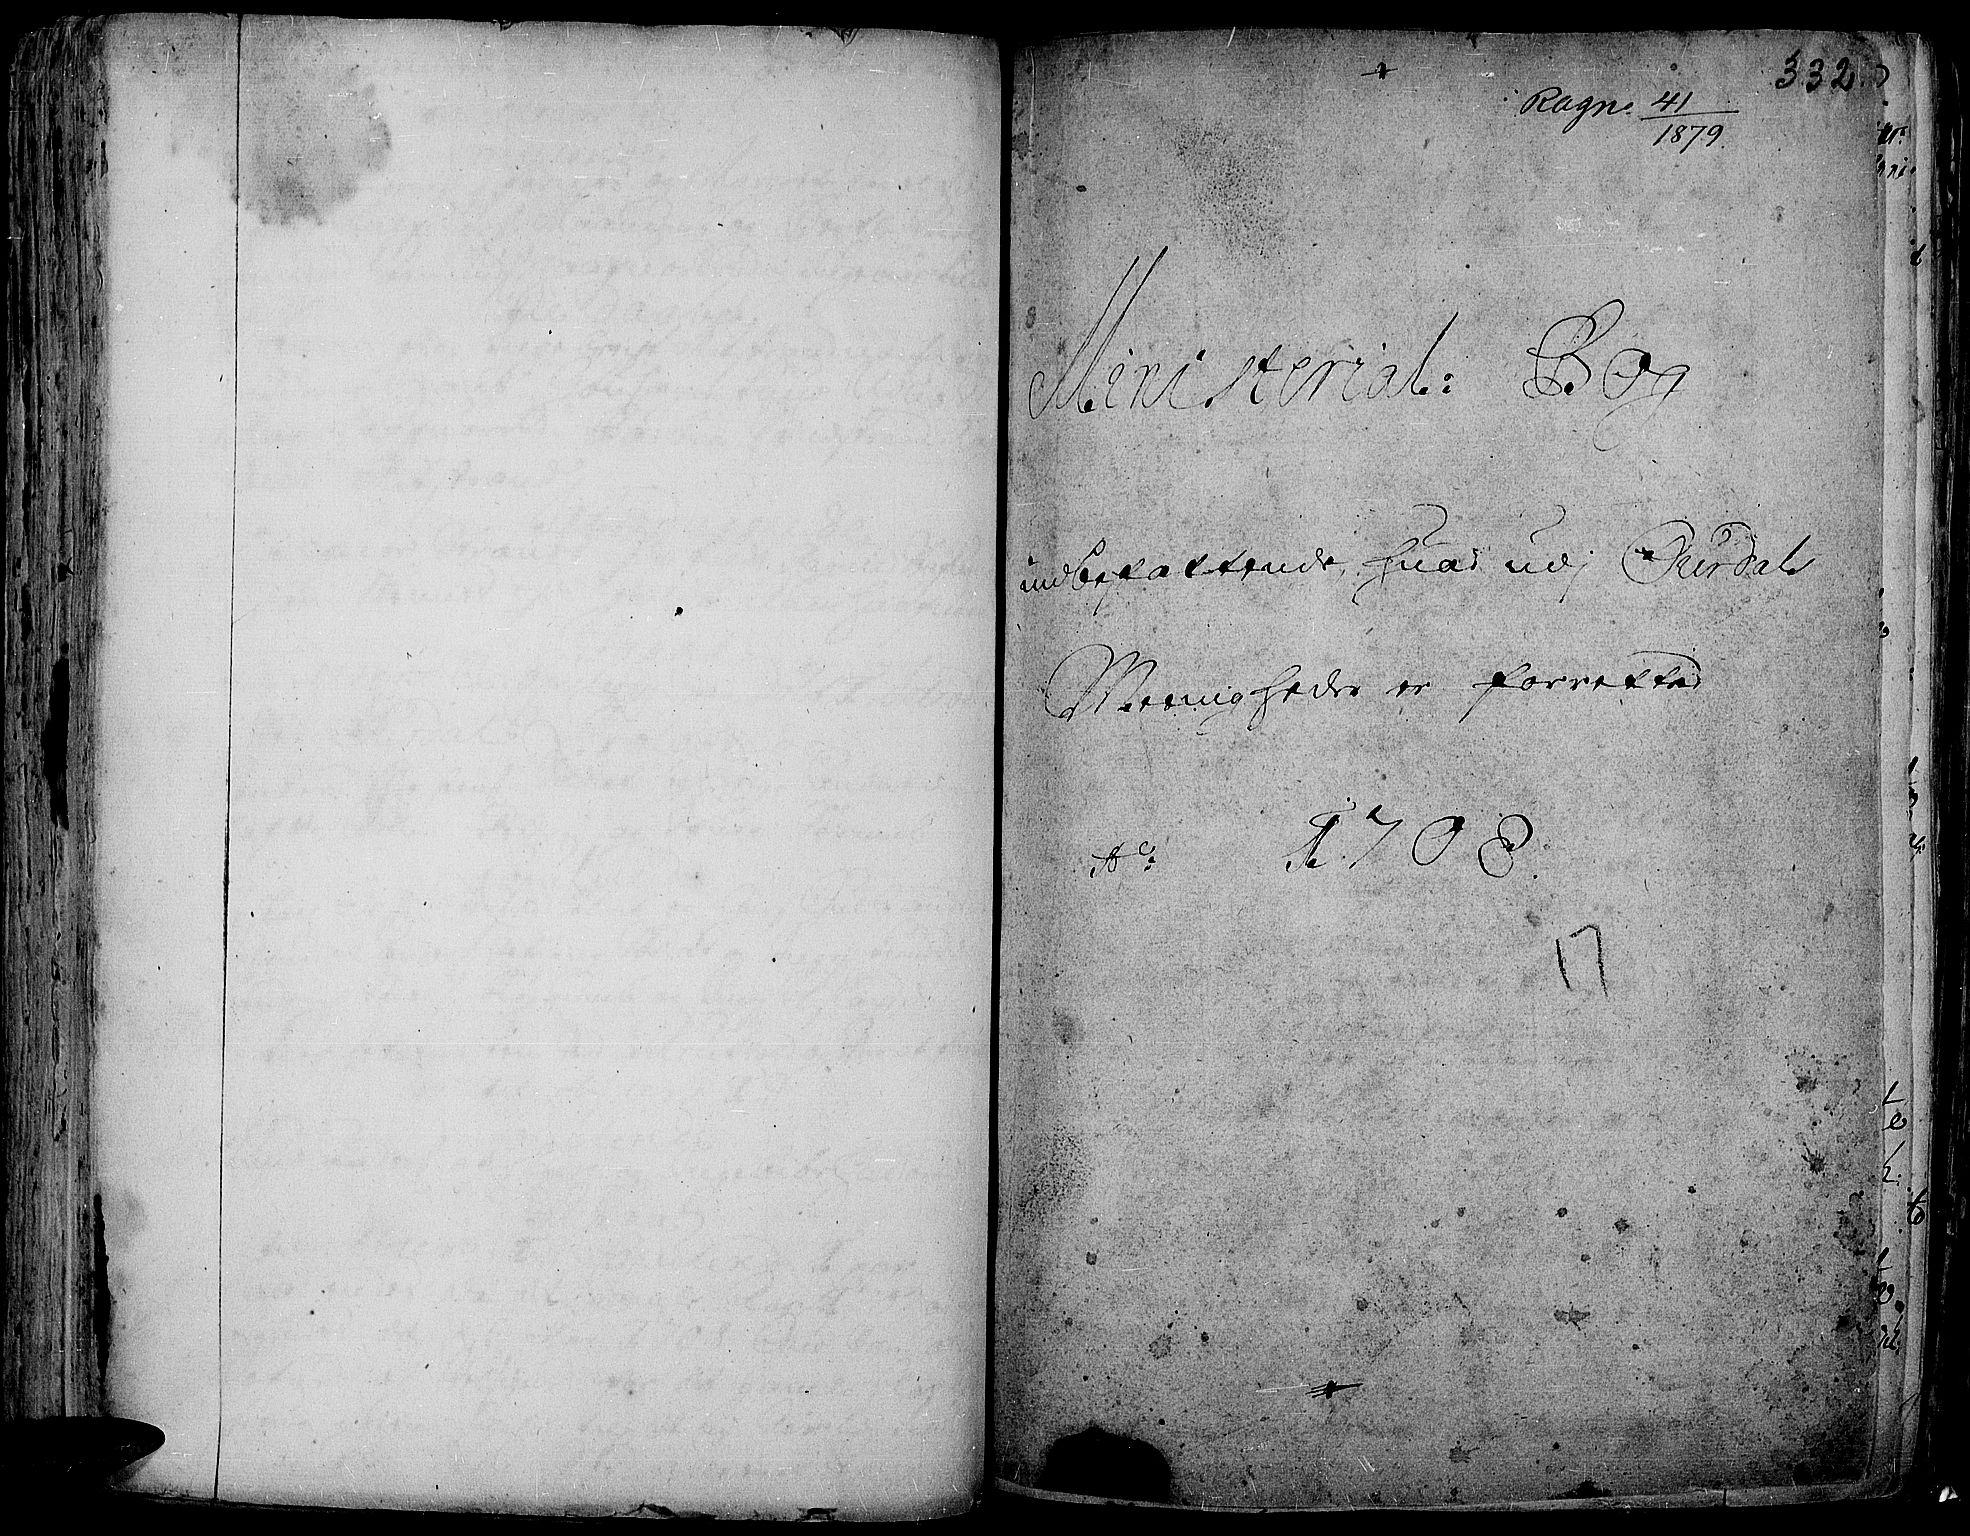 SAH, Aurdal prestekontor, Ministerialbok nr. 1-3, 1692-1730, s. 332